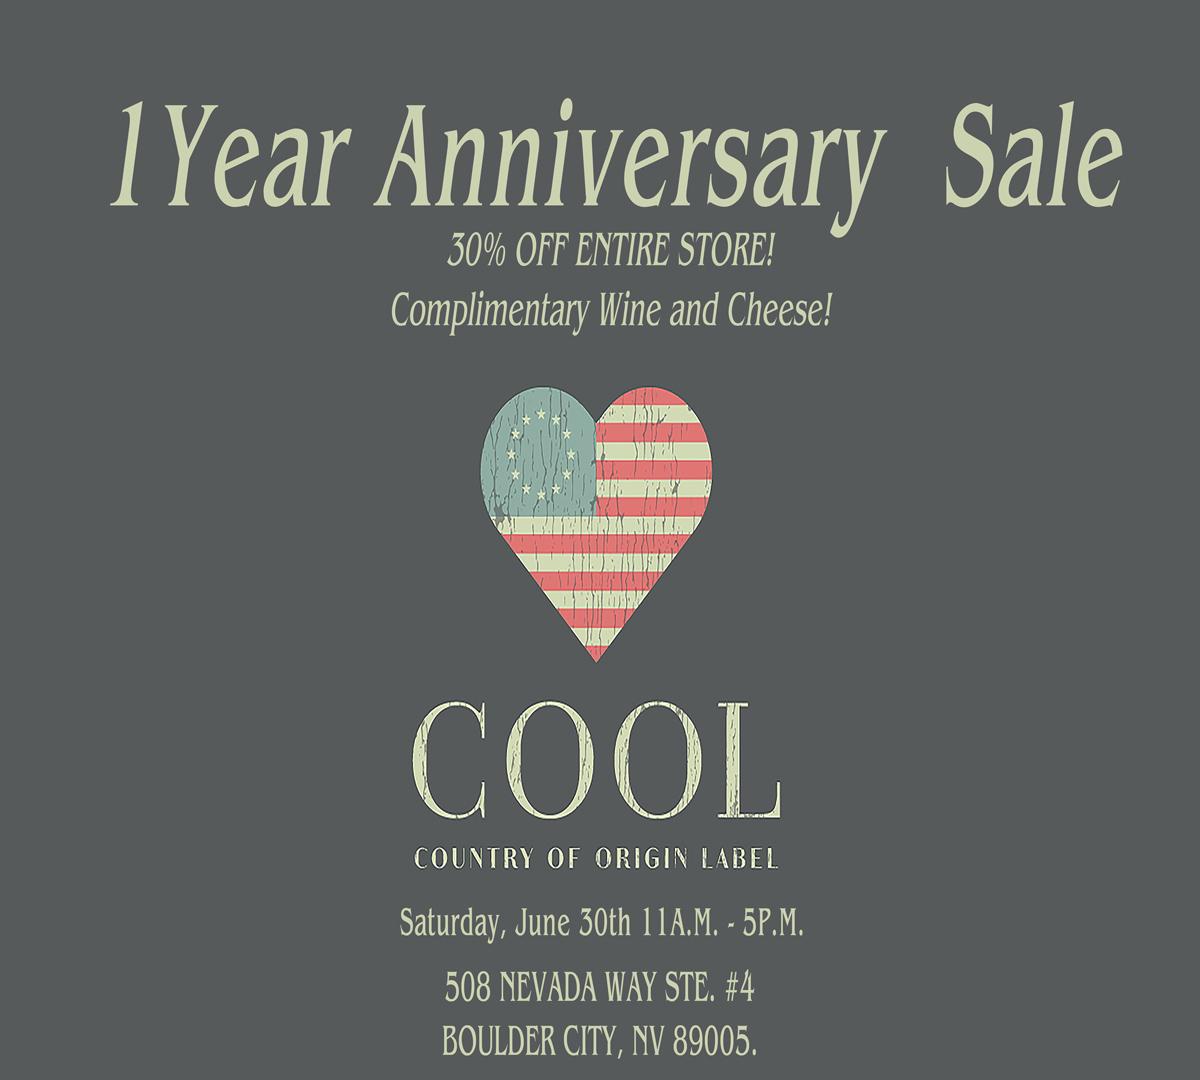 COOL Anniversary Sale Boulder City, NV